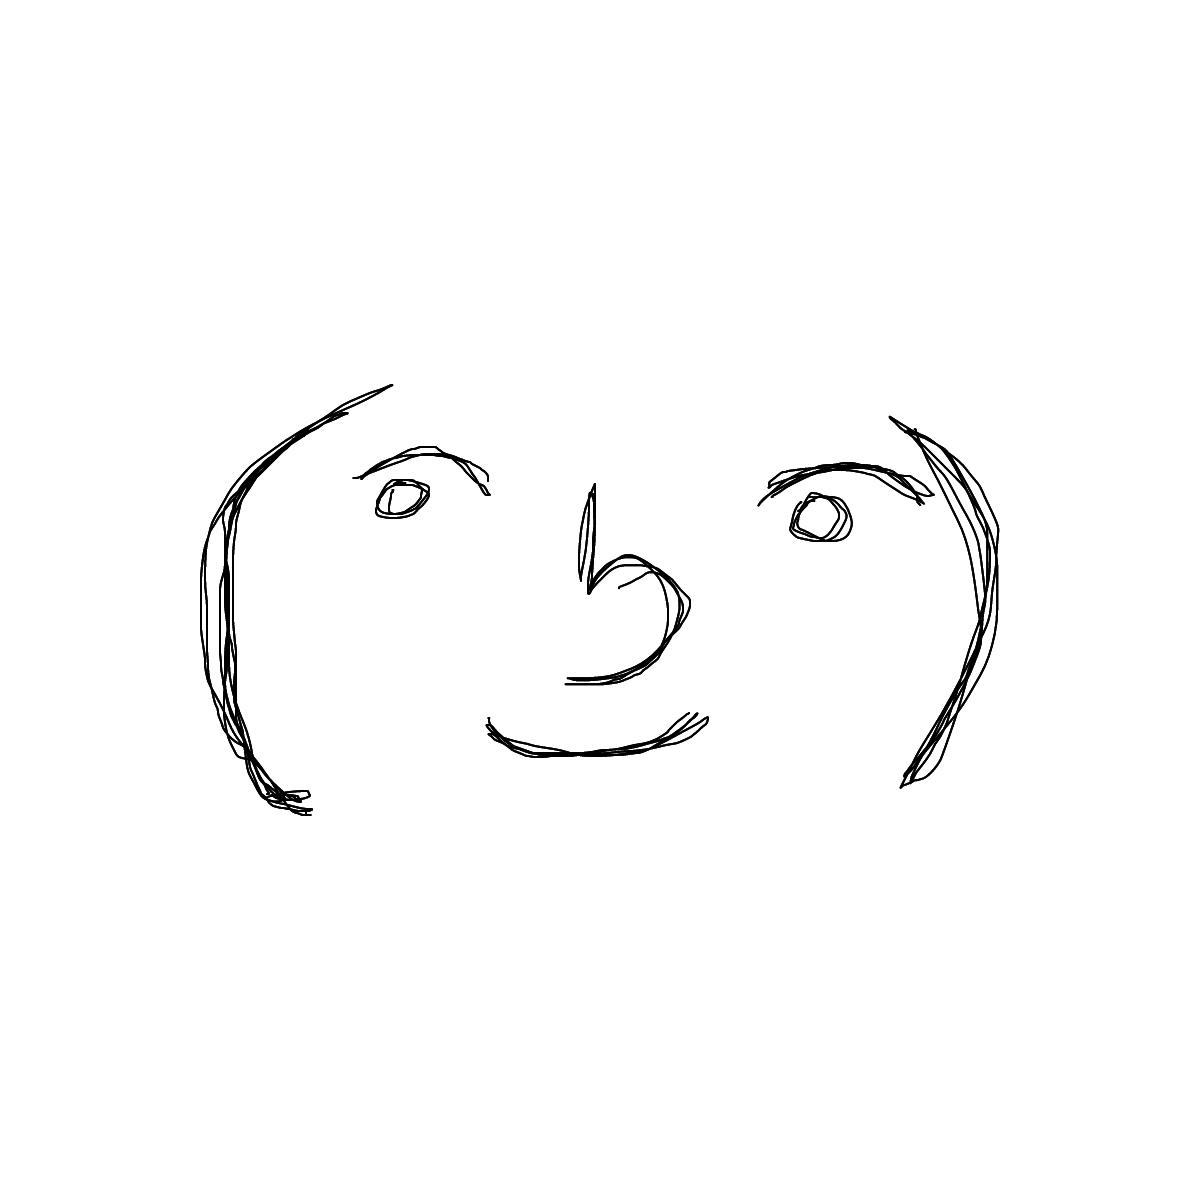 BAAAM drawing#15873 lat:50.5648078918457000lng: 21.1735038757324220